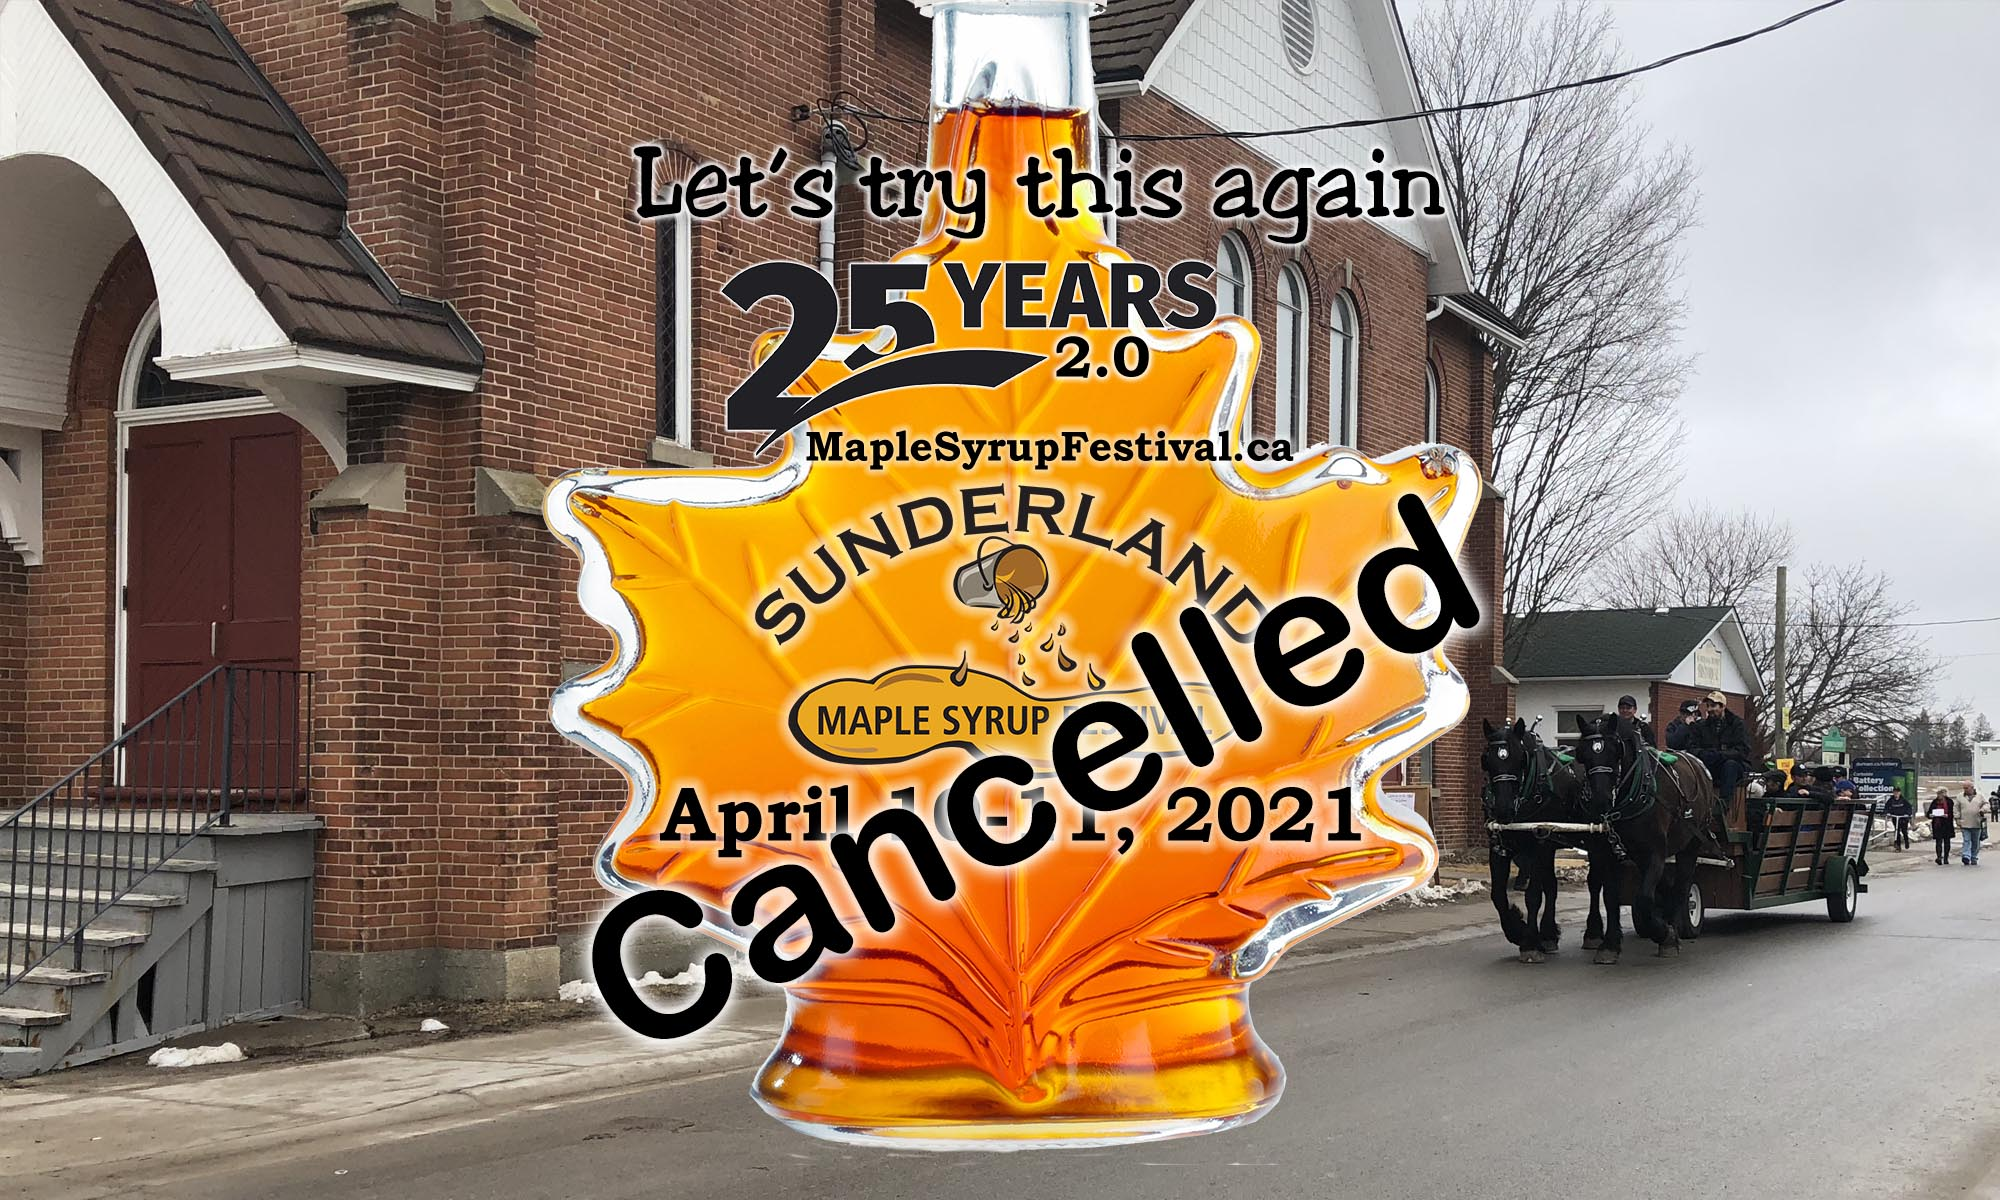 Sunderland Maple Syrup Festival - 25 Years